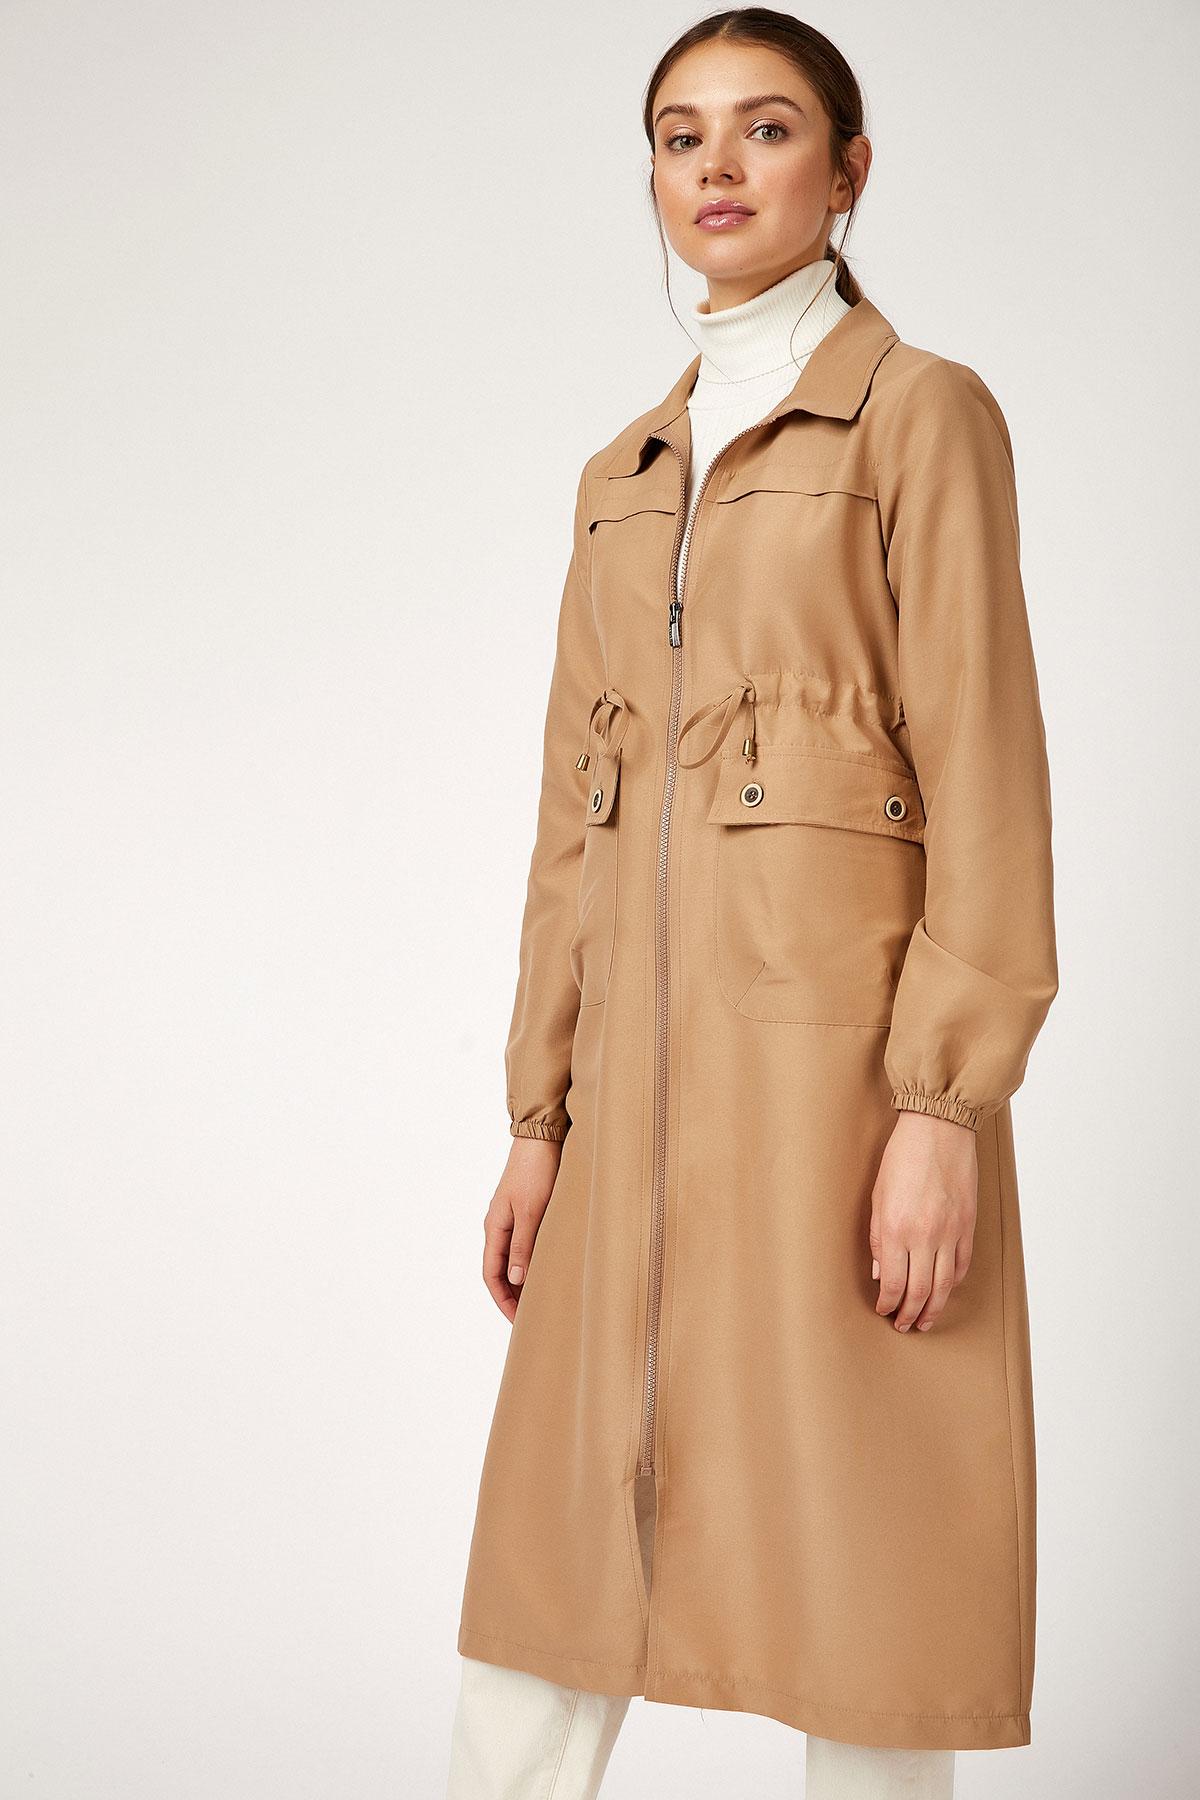 Women's Zipped Modest Trenchcoat